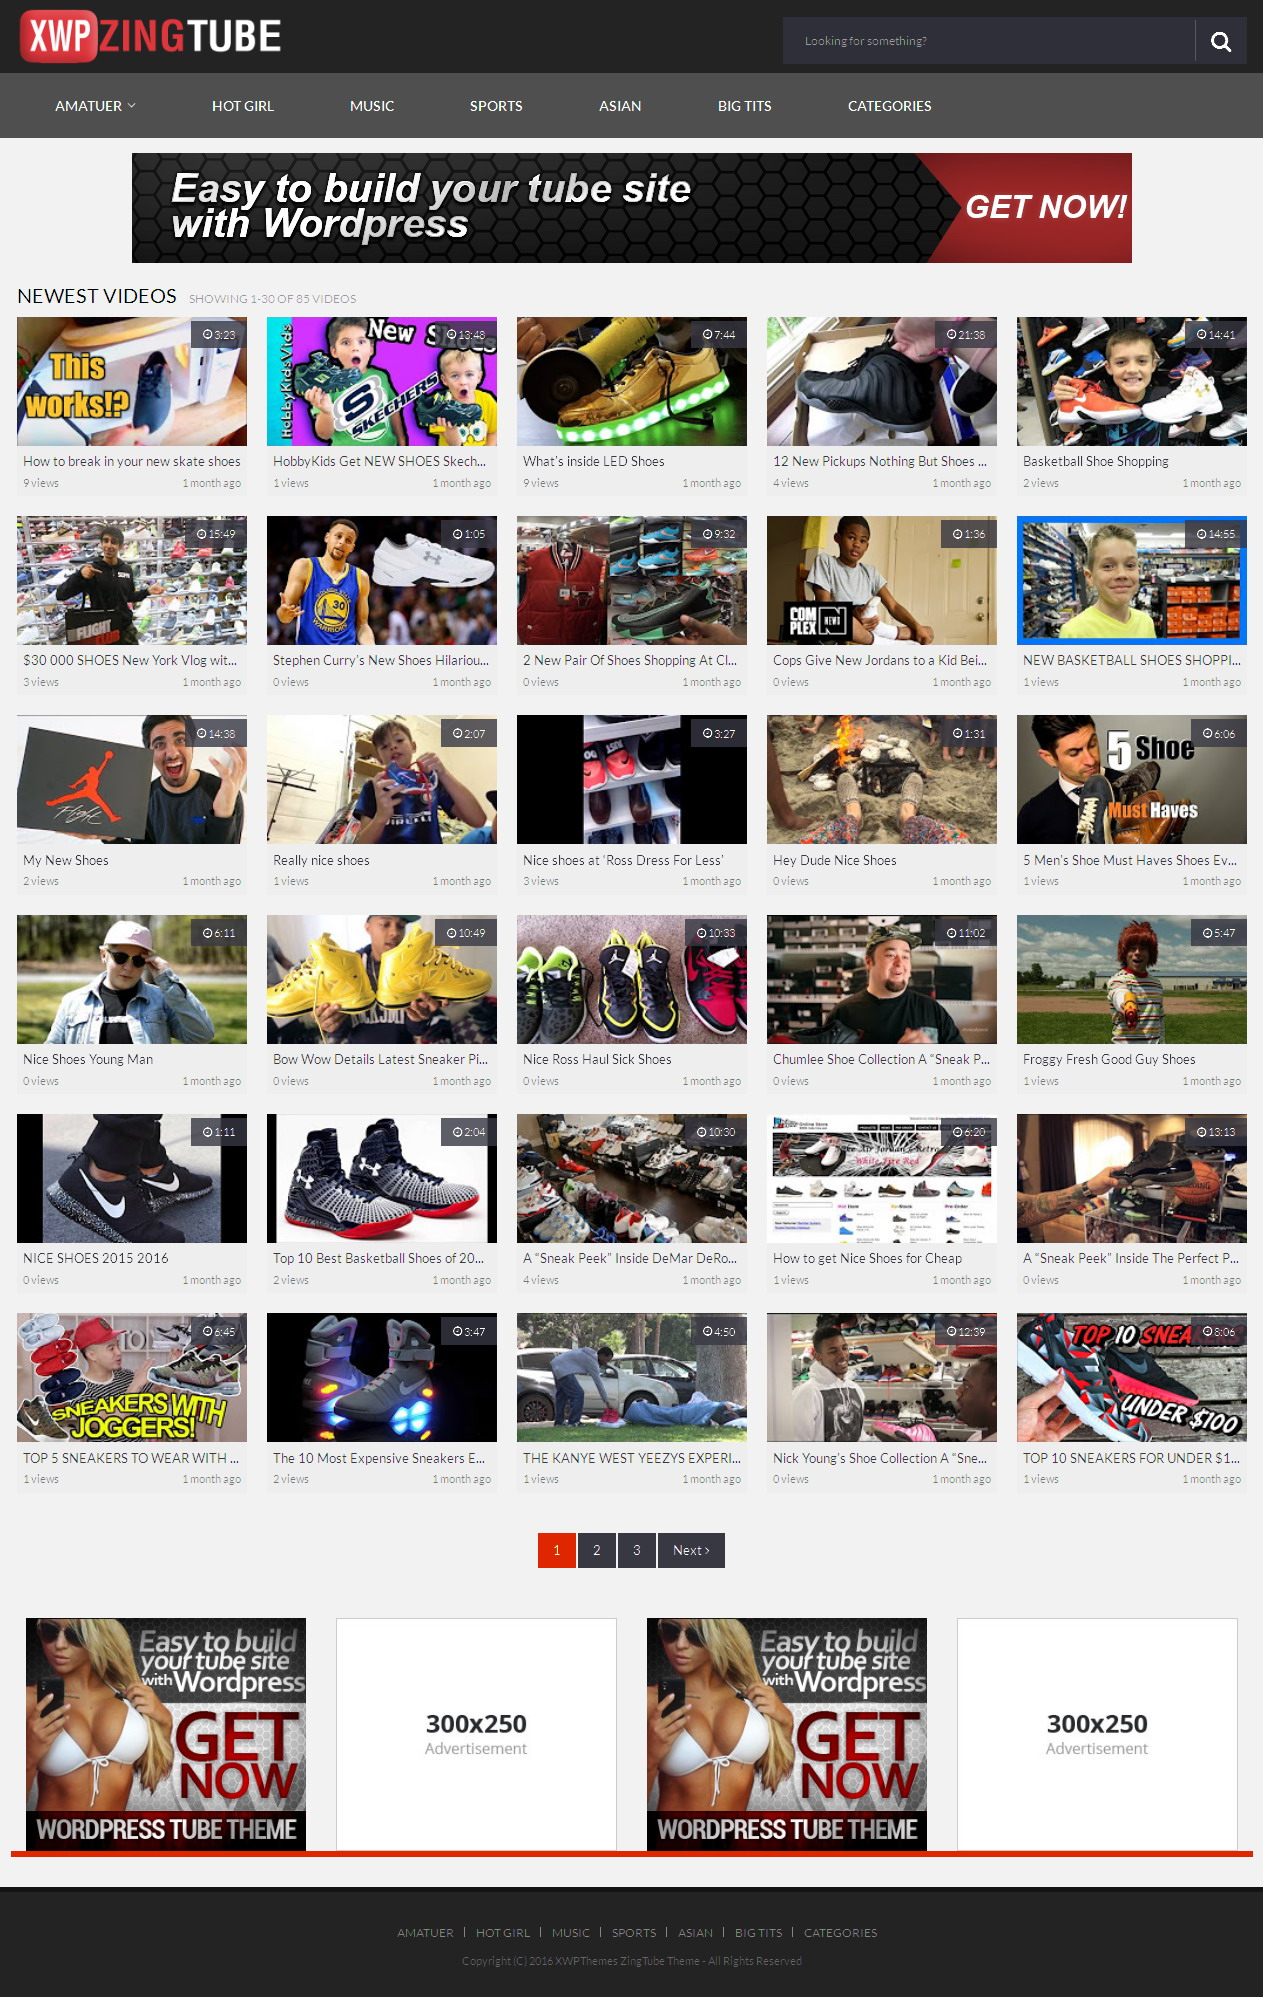 screenshot-demo kenthemes com 2016-08-31 10-50-51